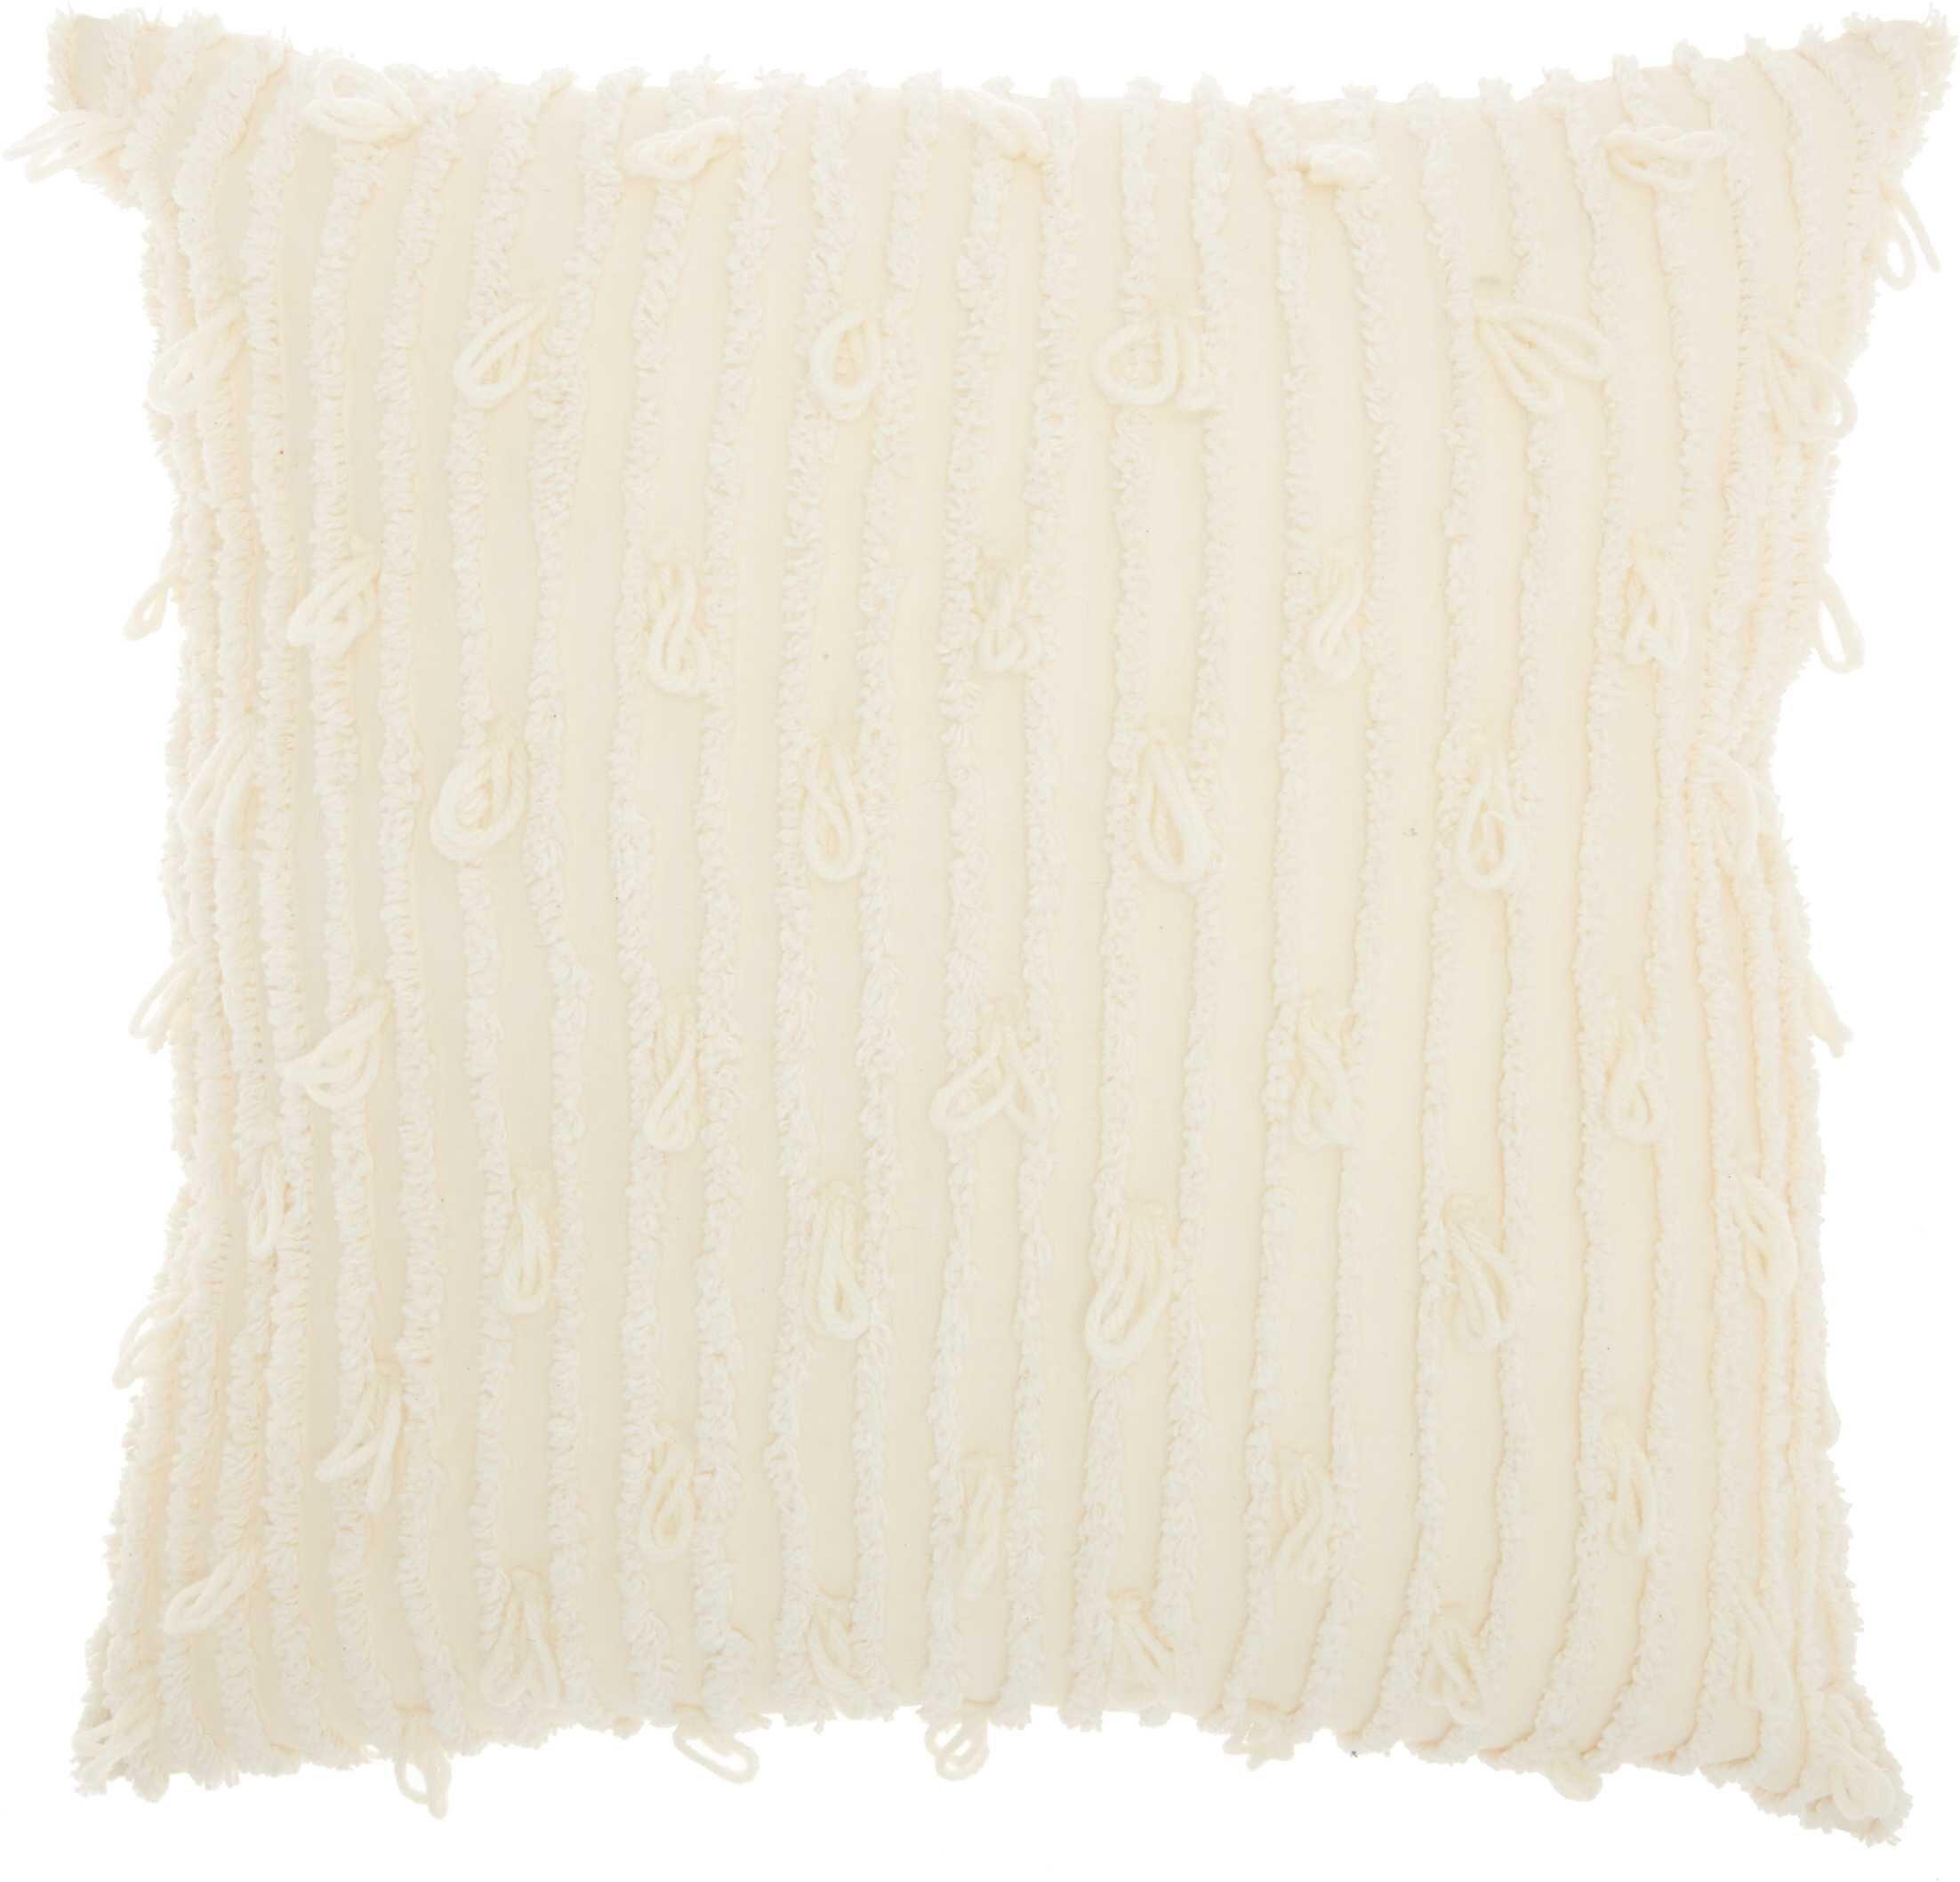 Striped Joss Main Throw Pillows You Ll Love In 2021 Wayfair